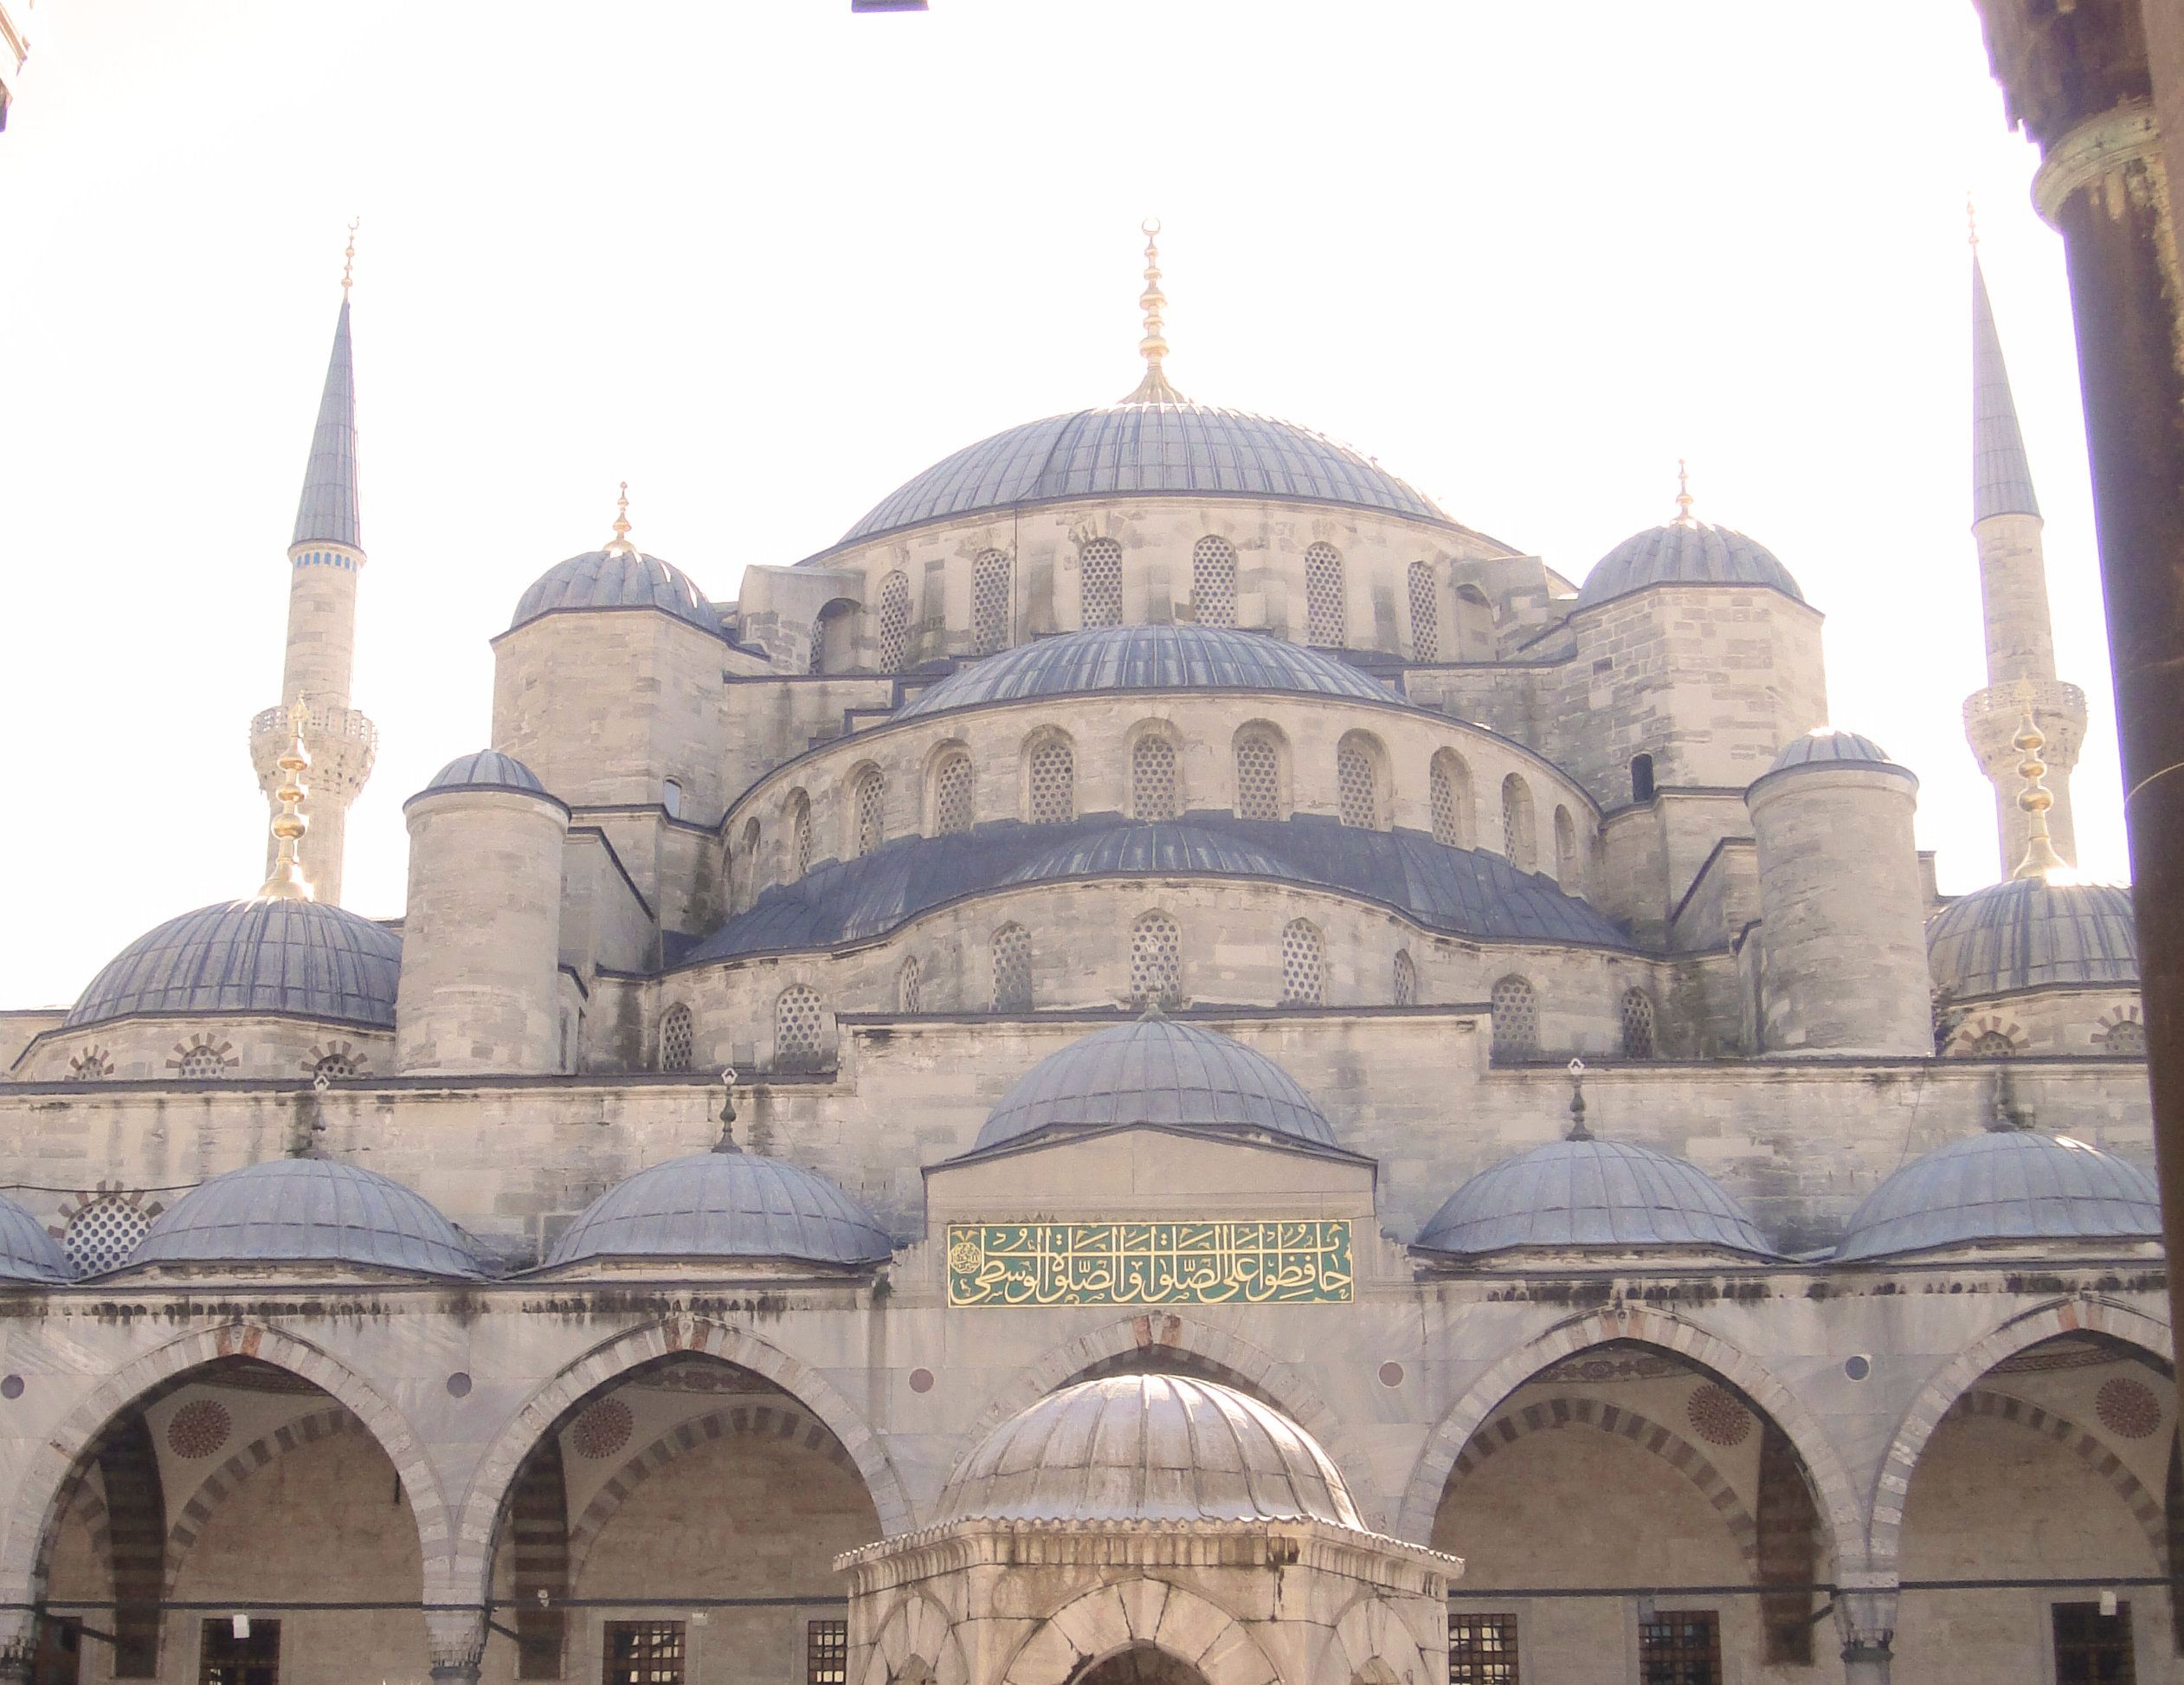 Blue Mosque @ Istanbul, Turkey